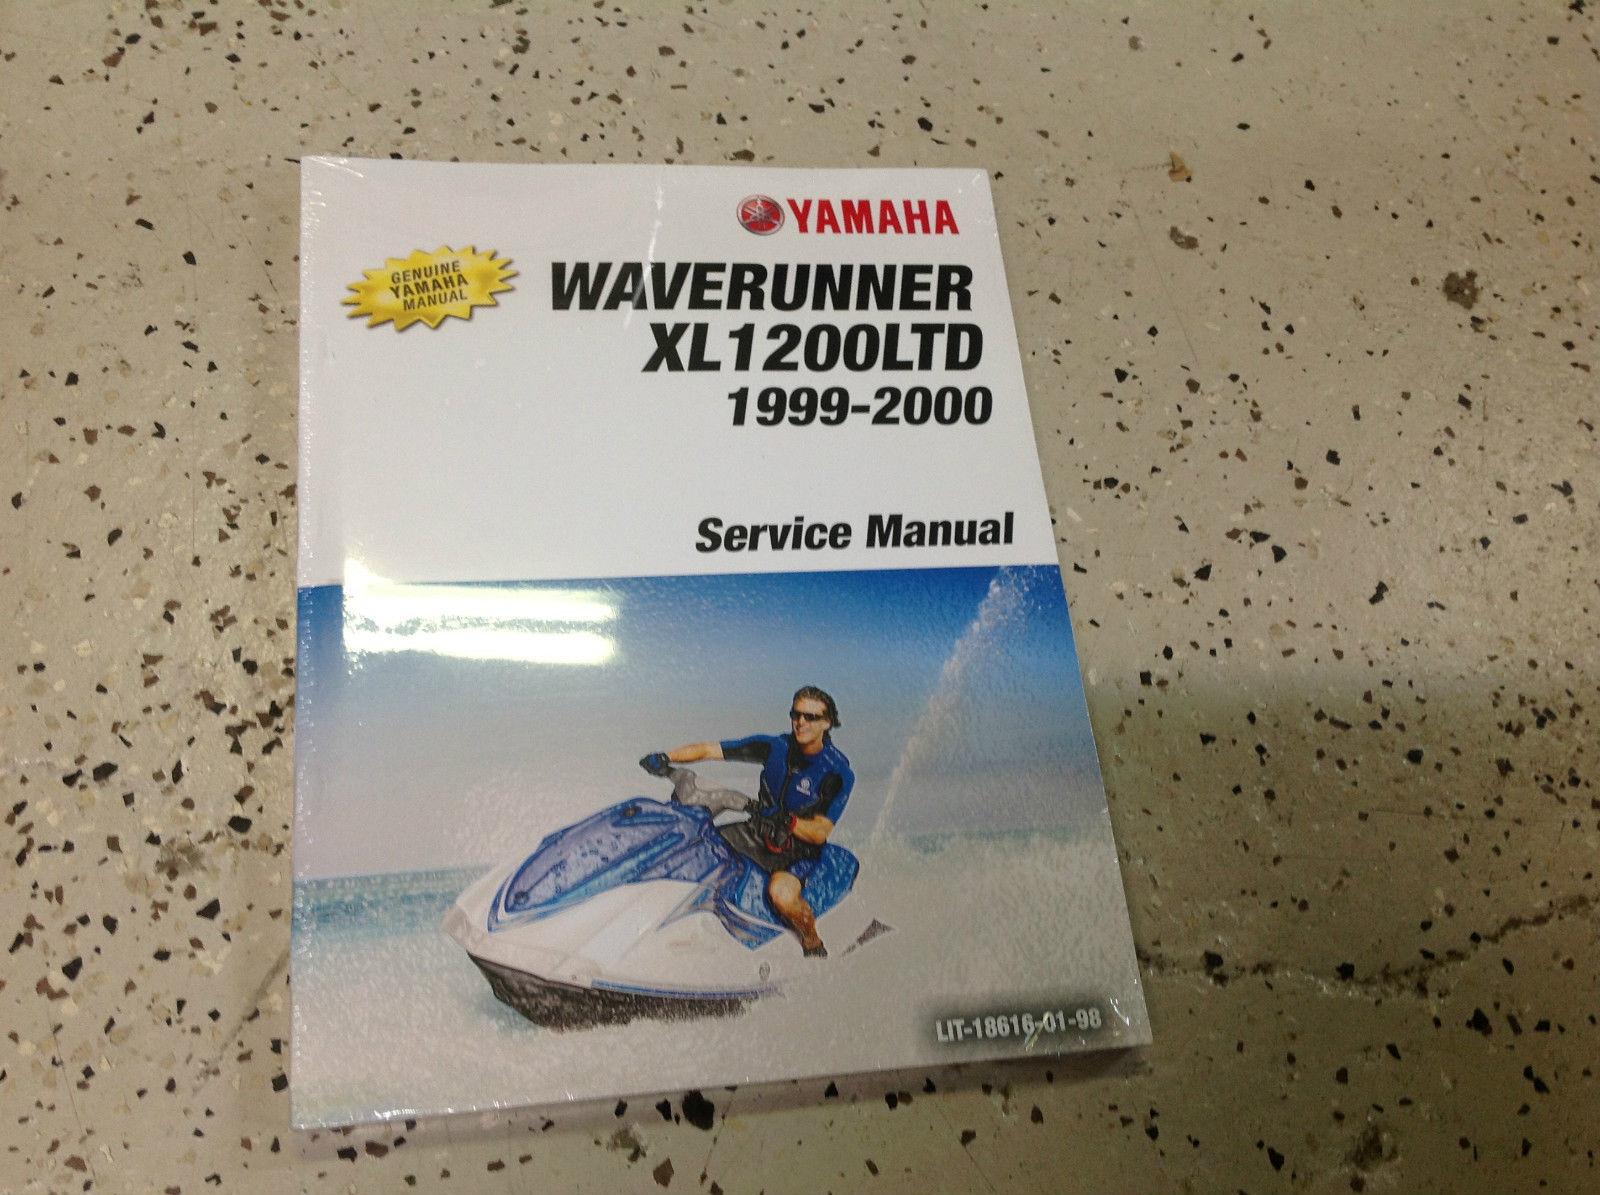 1999 2000 YAMAHA WAVERUNNER XL1200 Ltd Service Repair Shop Manual BRAND NEW  X